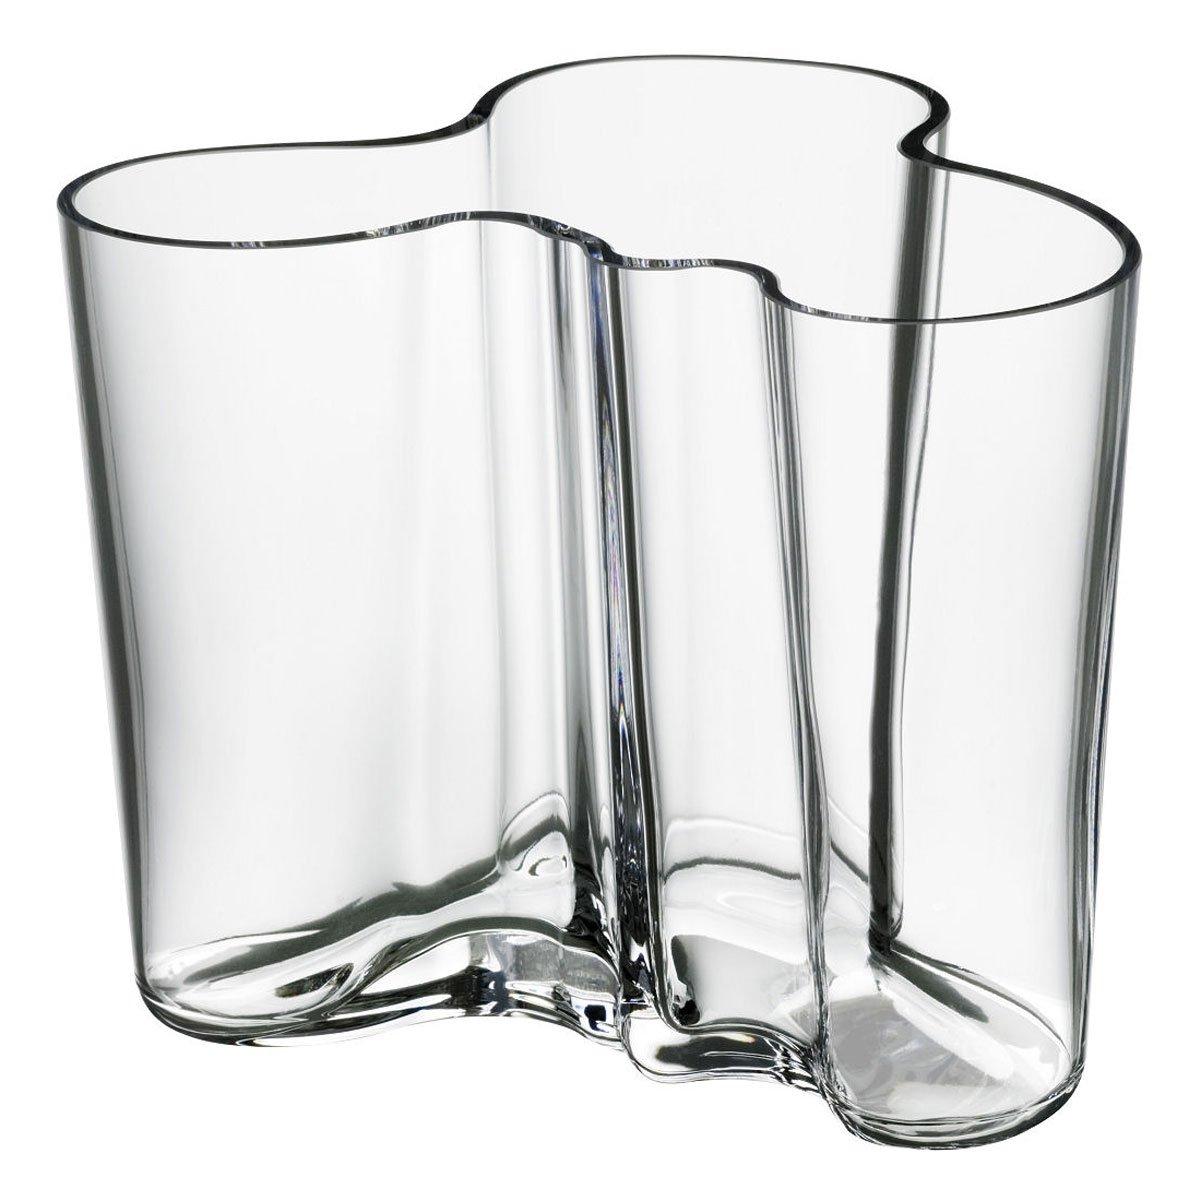 Amazon iittala alvar aalto collection vase 475 clear home amazon iittala alvar aalto collection vase 475 clear home kitchen reviewsmspy